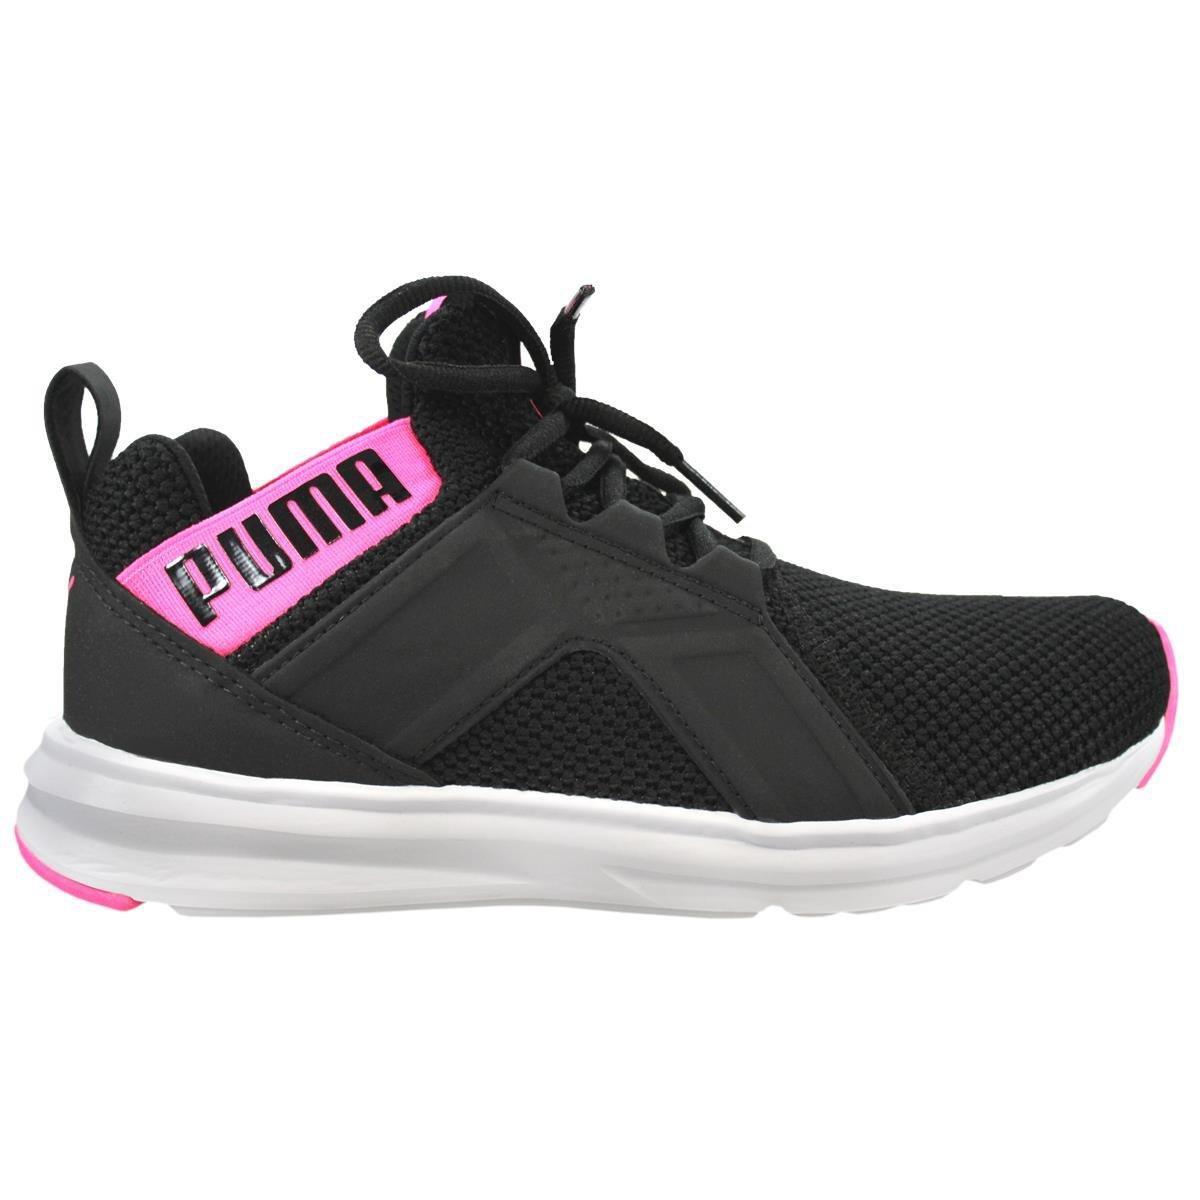 1f7b2605e0e6e Tênis Puma Enzo Weave Bdp Feminino - Preto e Pink | Netshoes